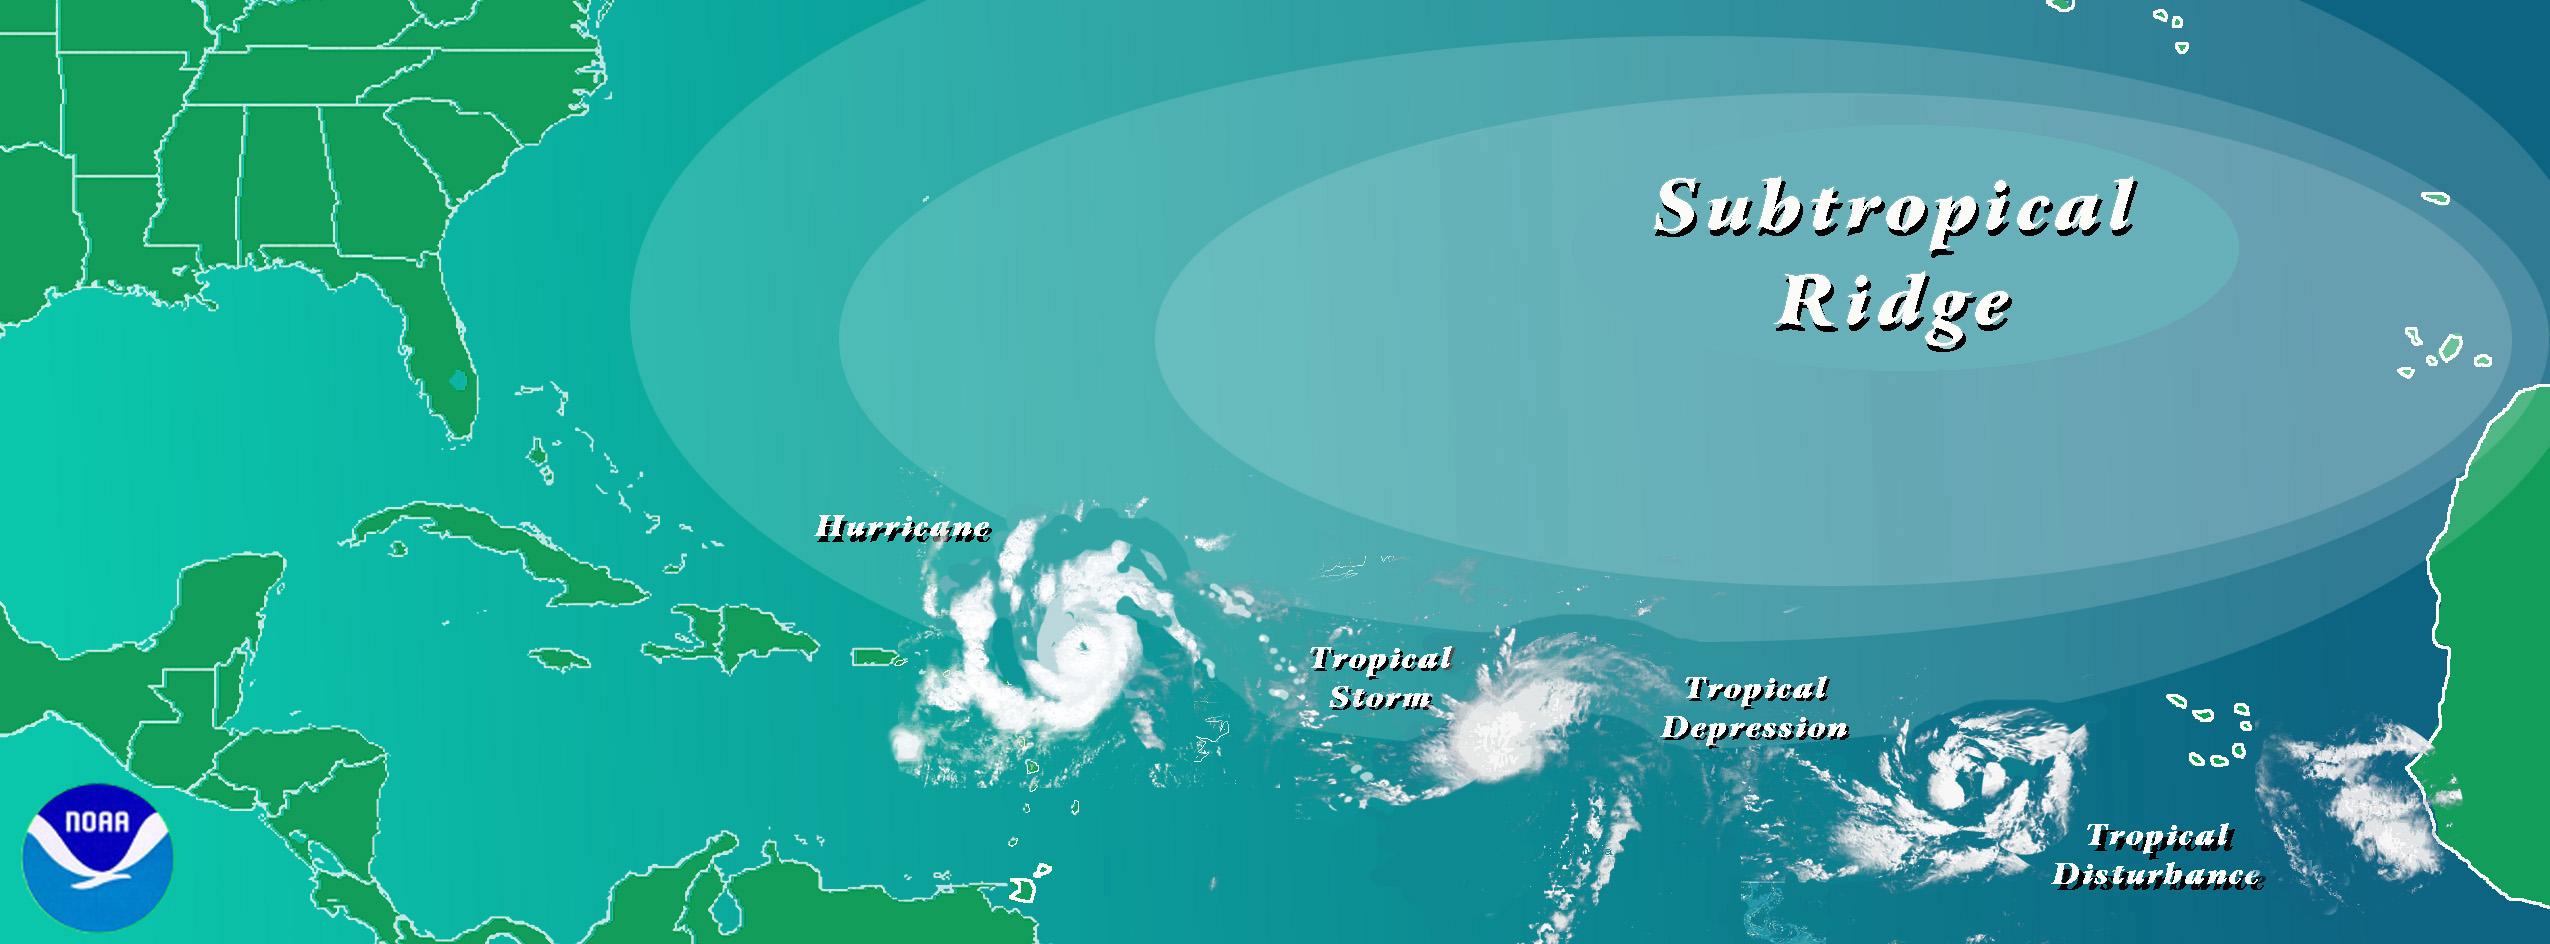 Source: Chris Landsea, National Hurricane Center, NOAA